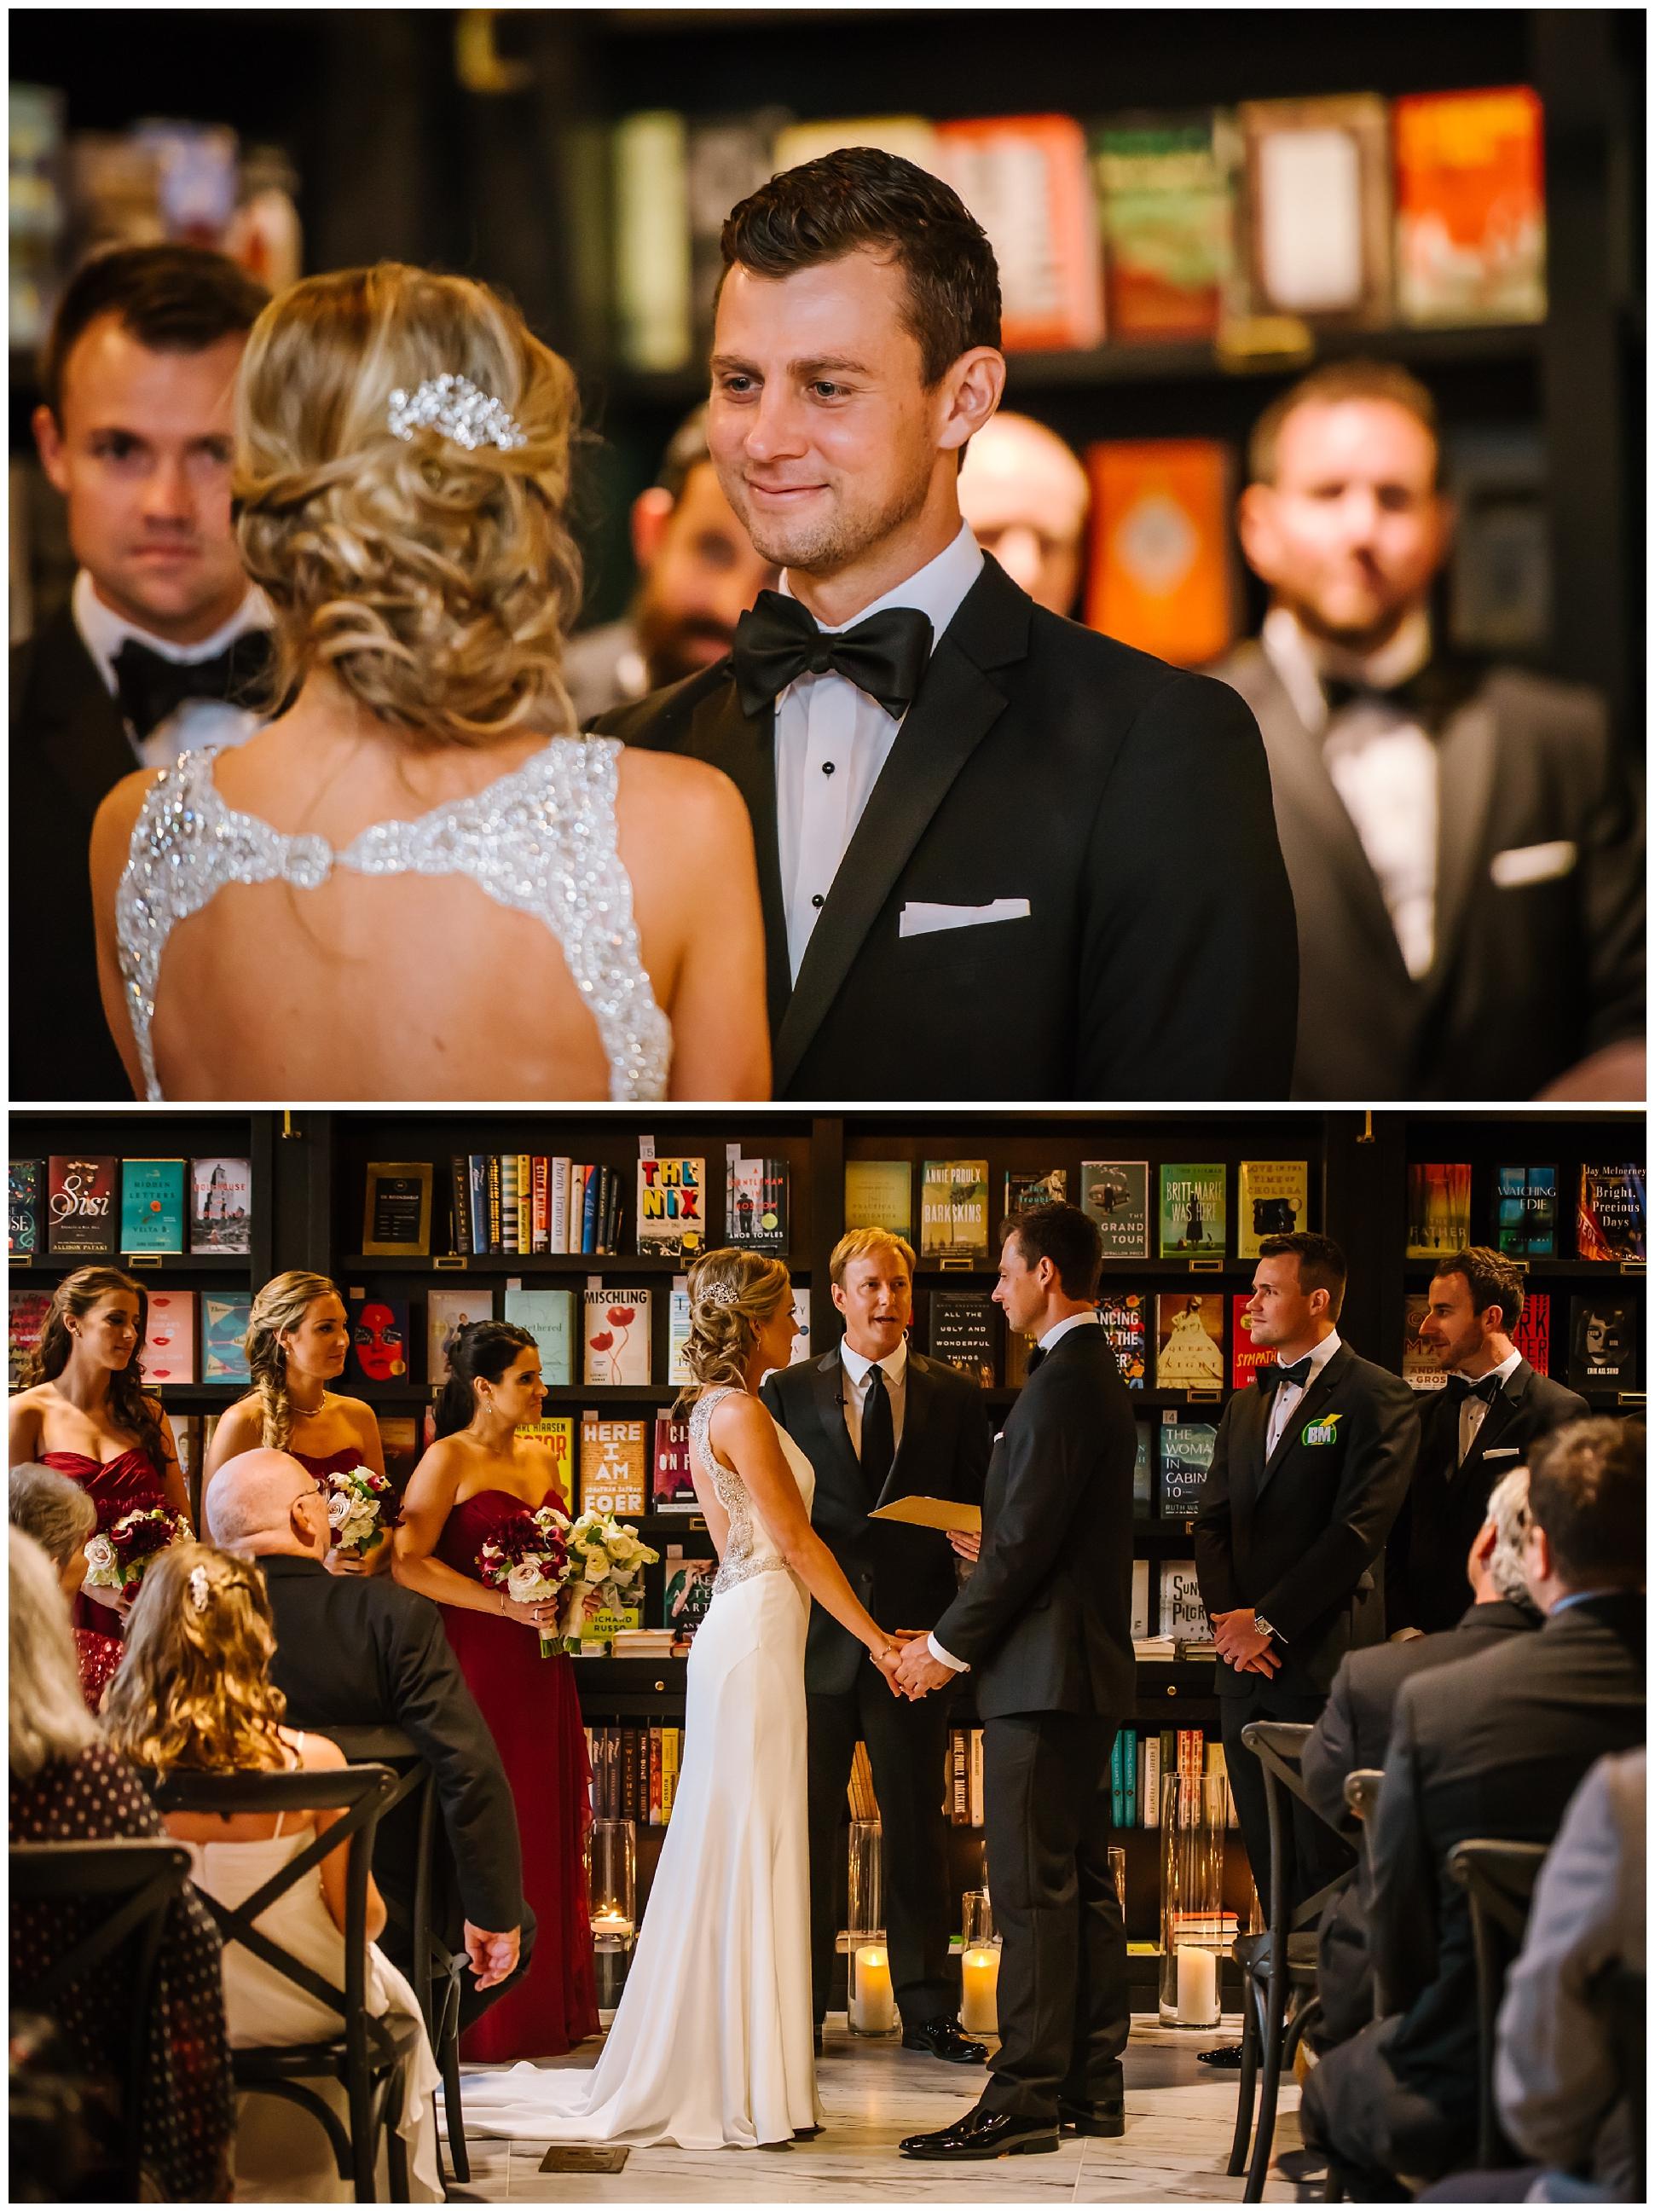 Oxford-exchange-wedding-photogapher-garland-candels-bookstore-burgandy-botanica_0047.jpg